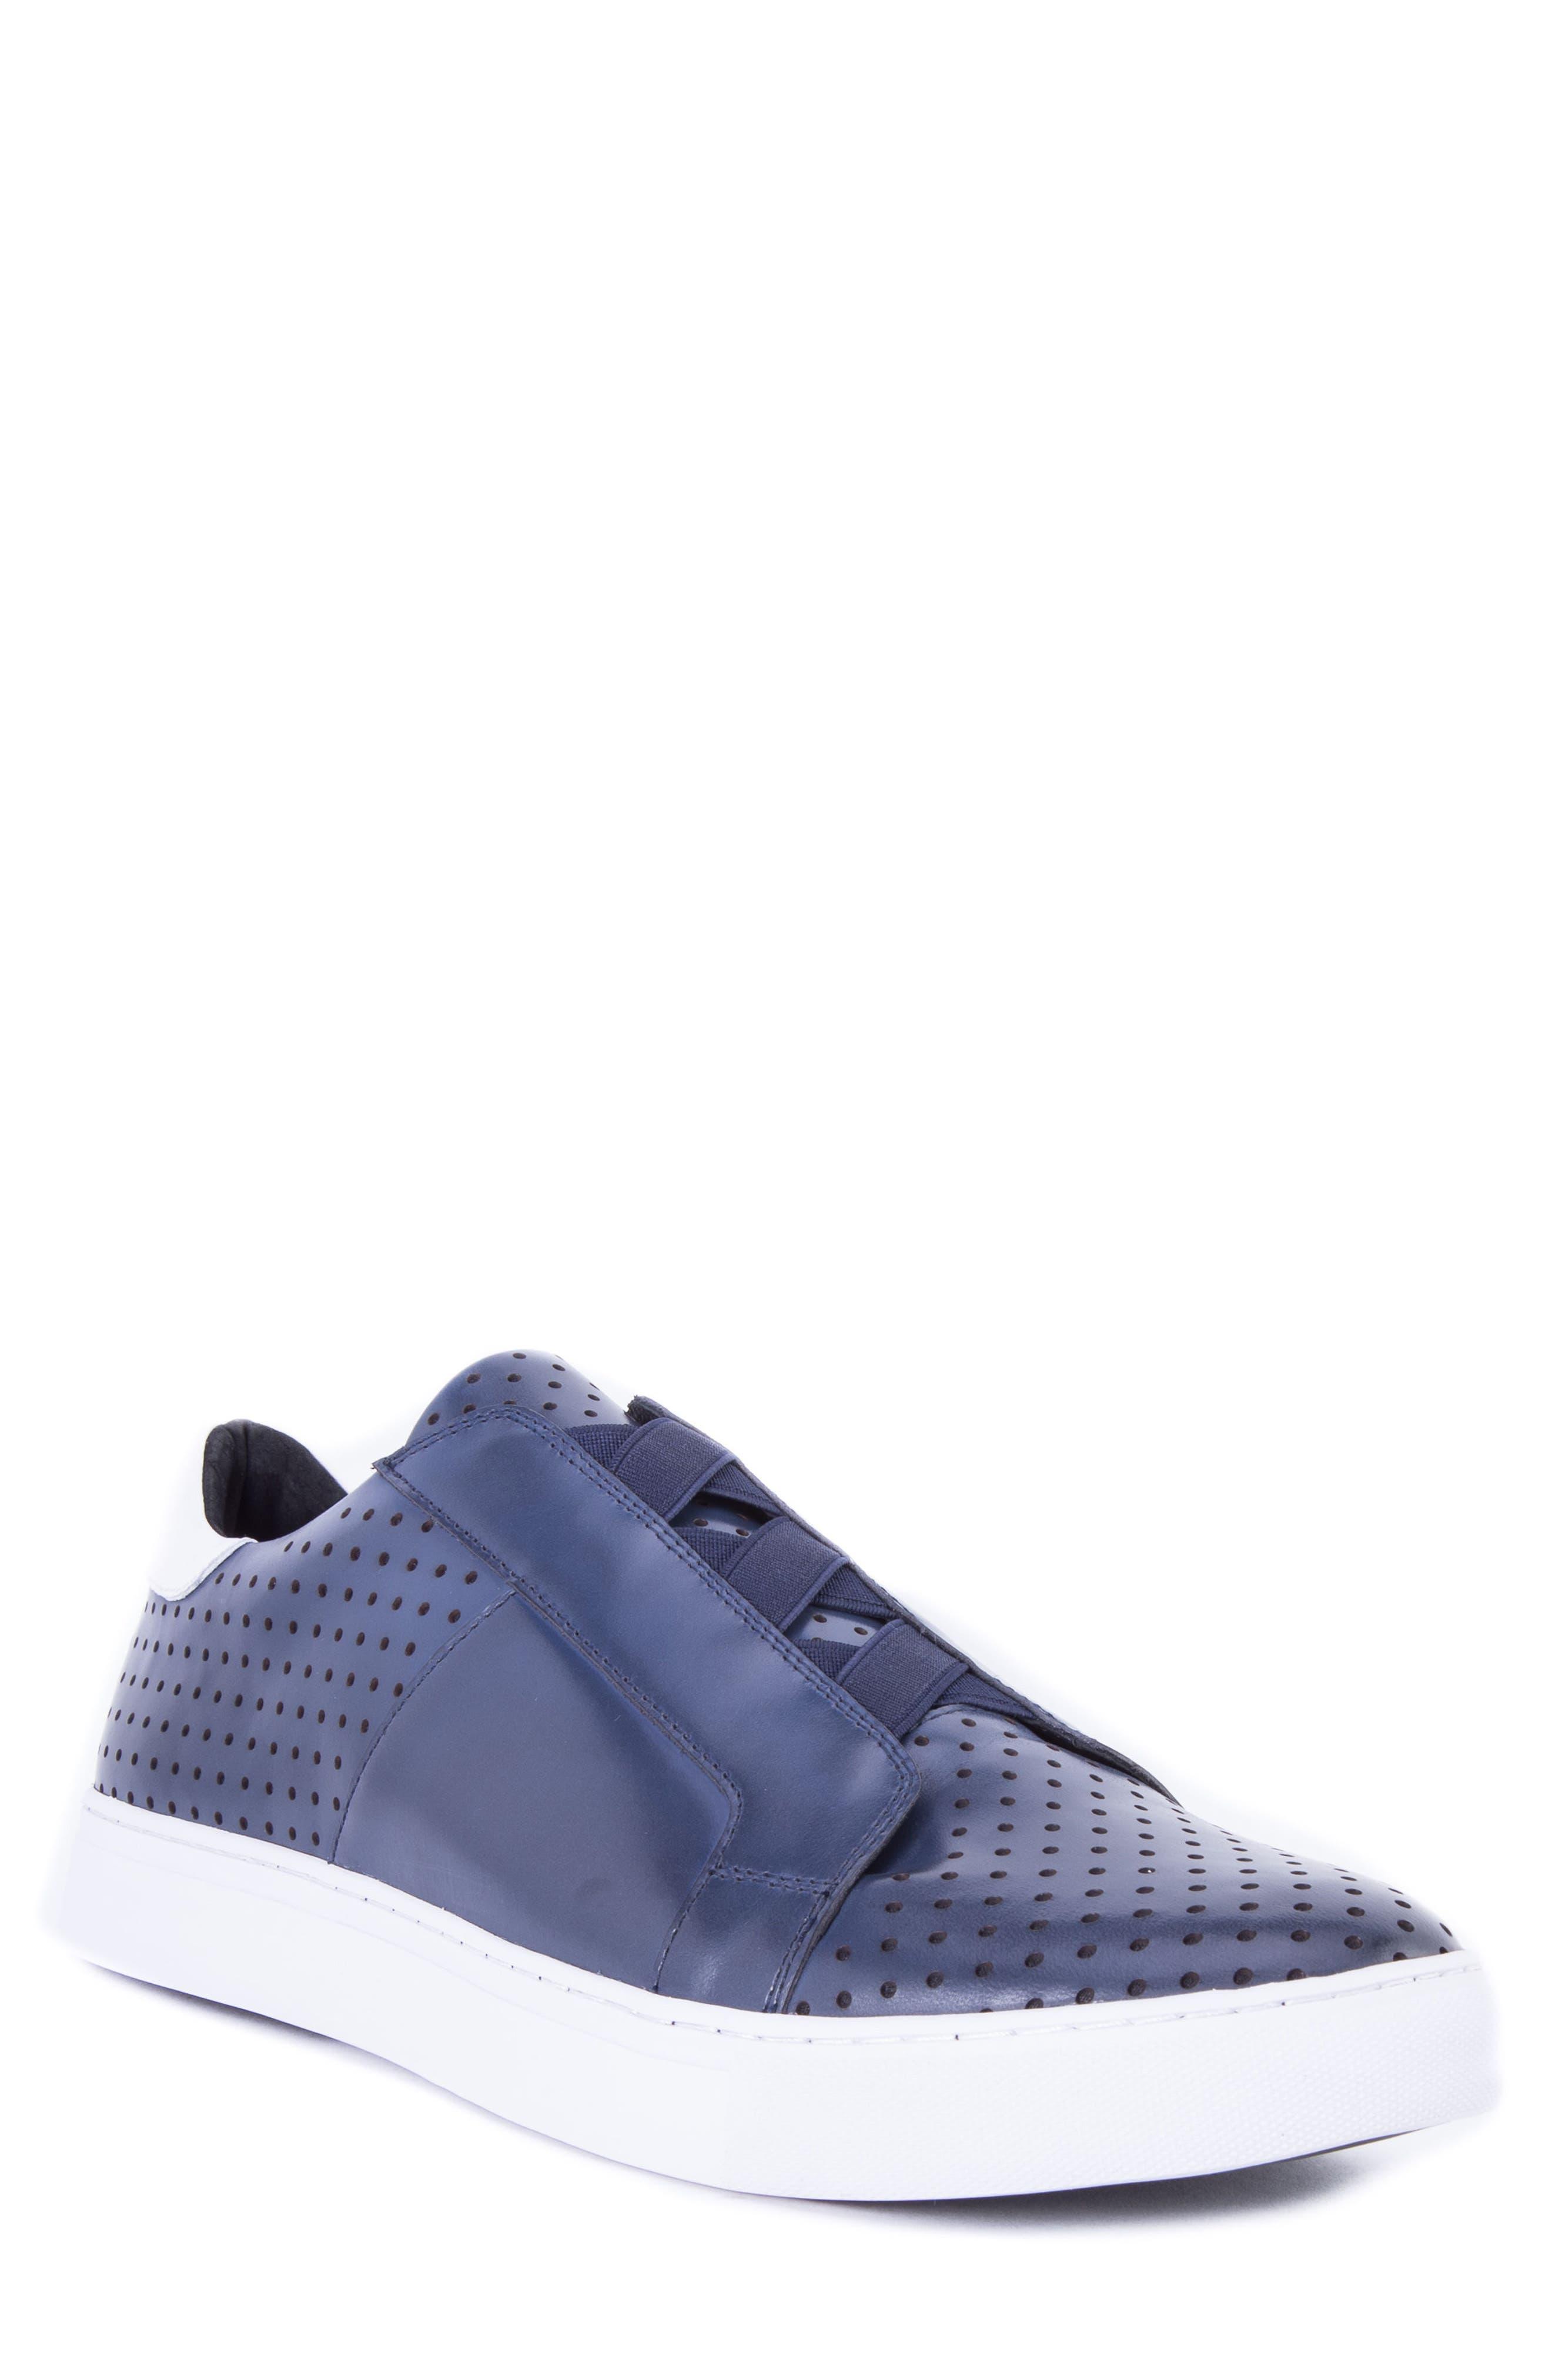 Robert Graham Rowley Perforated Laceless Sneaker, Blue